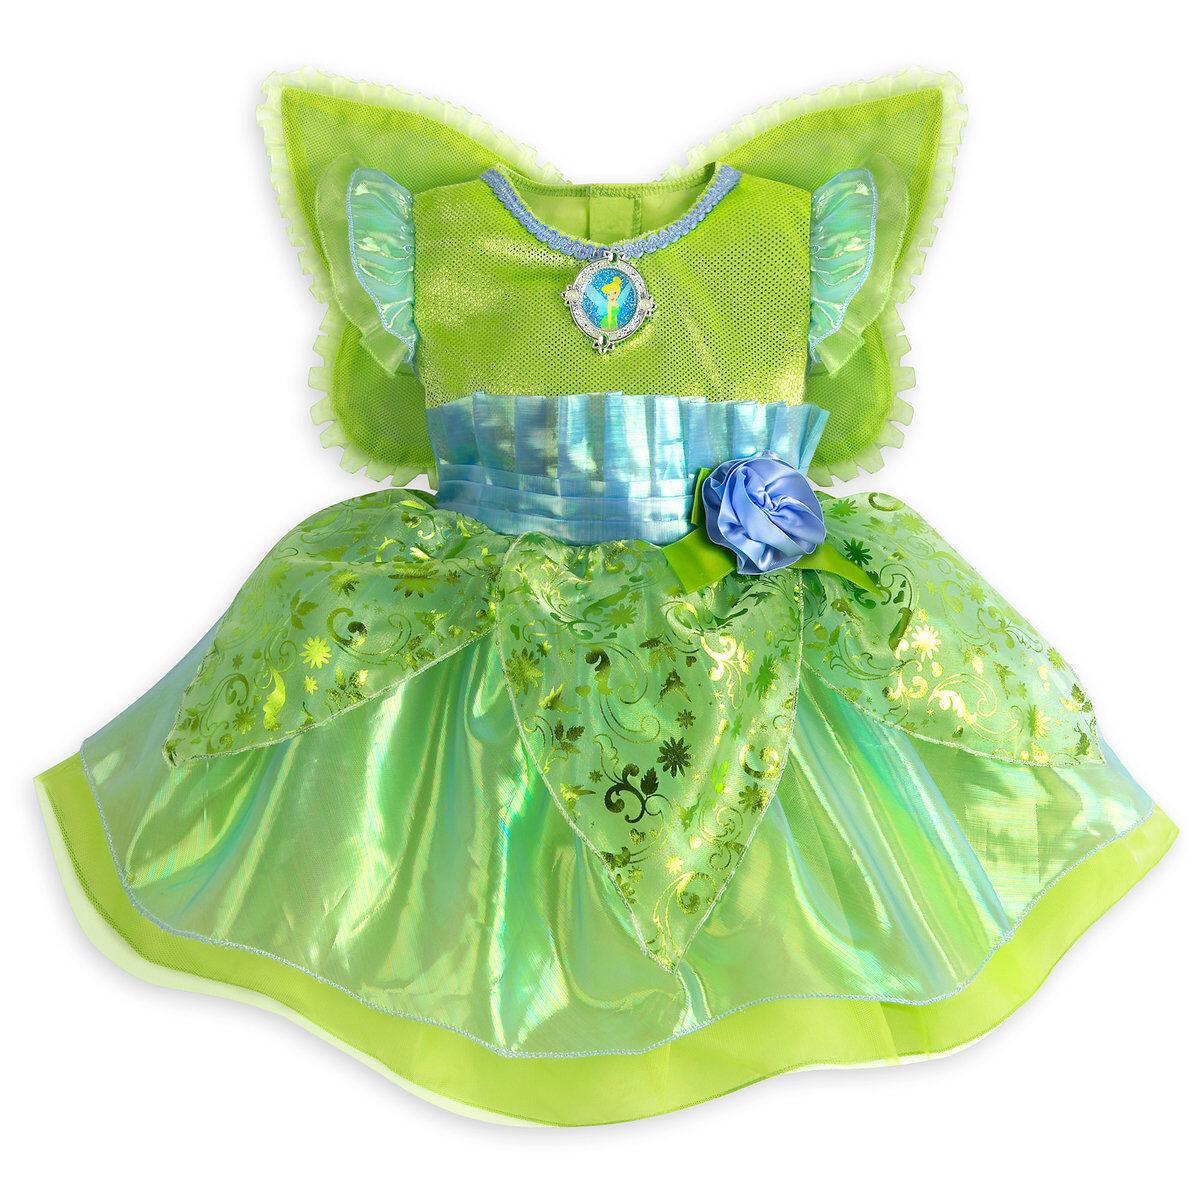 NWT Disney Store Tinker Bell Deluxe Costume Baby Girl 3 6 12